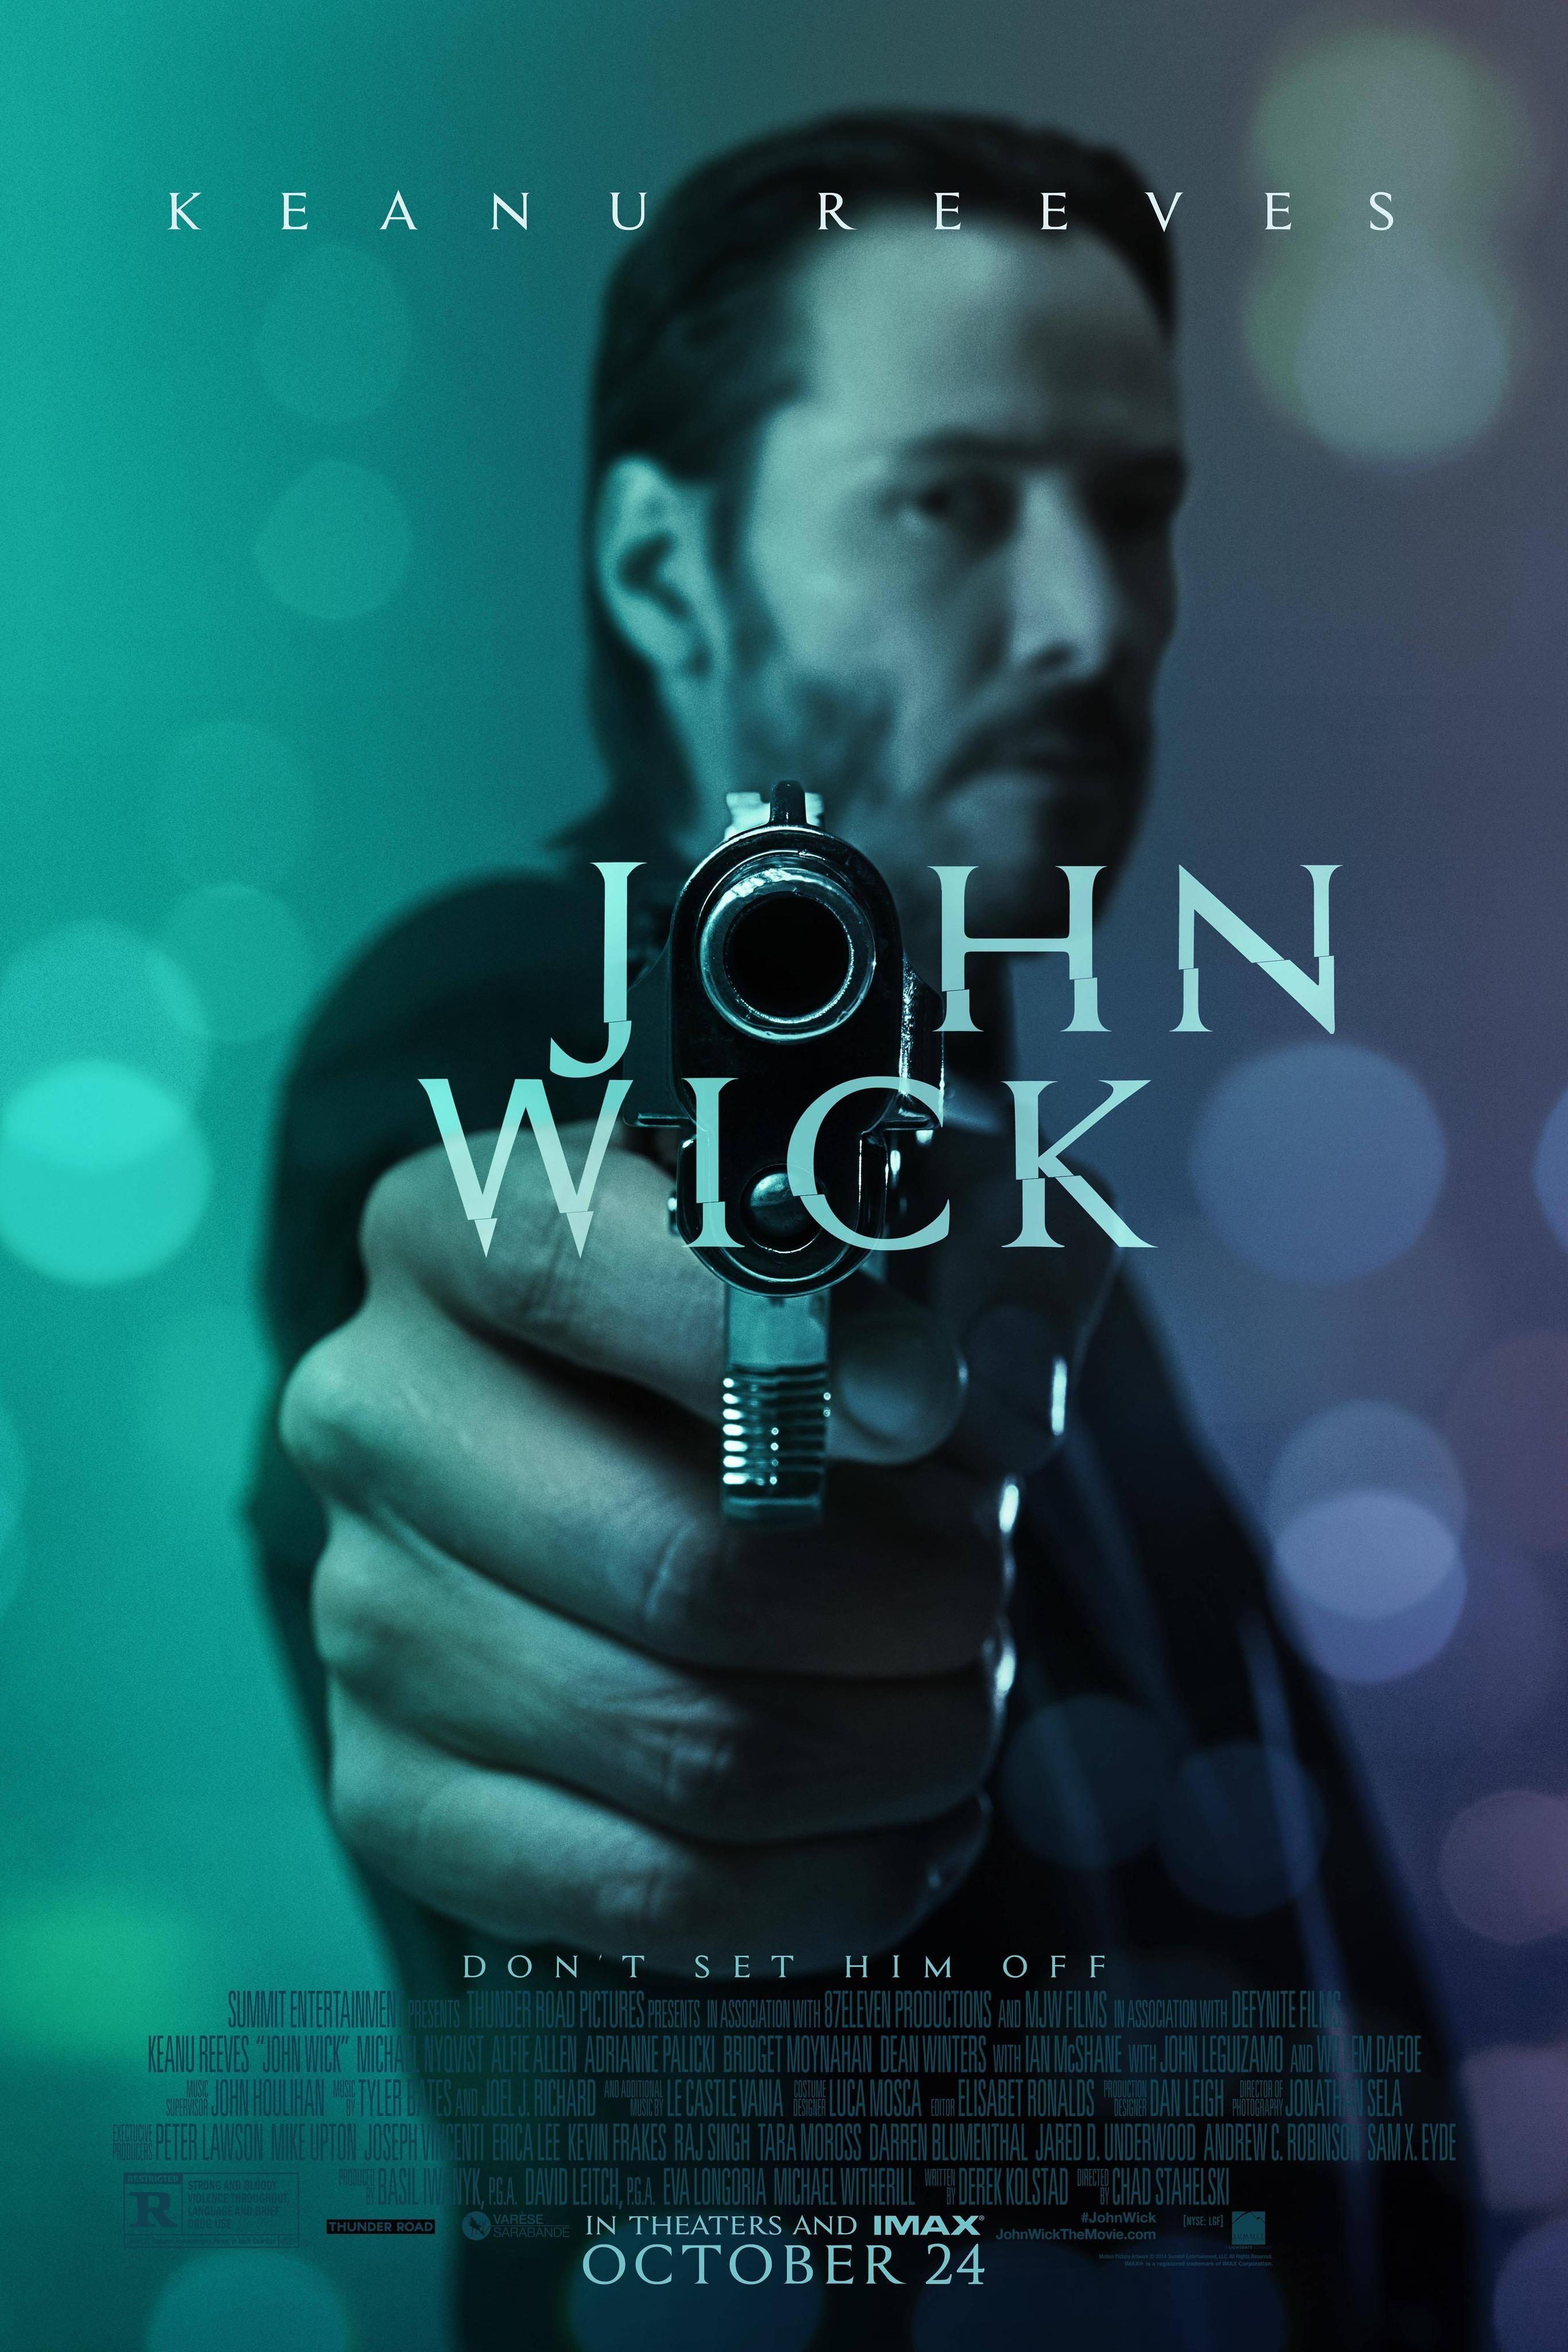 Pin De Heidi Garcia En Nostalgia John Wick Peliculas Completas Peliculas Gratis